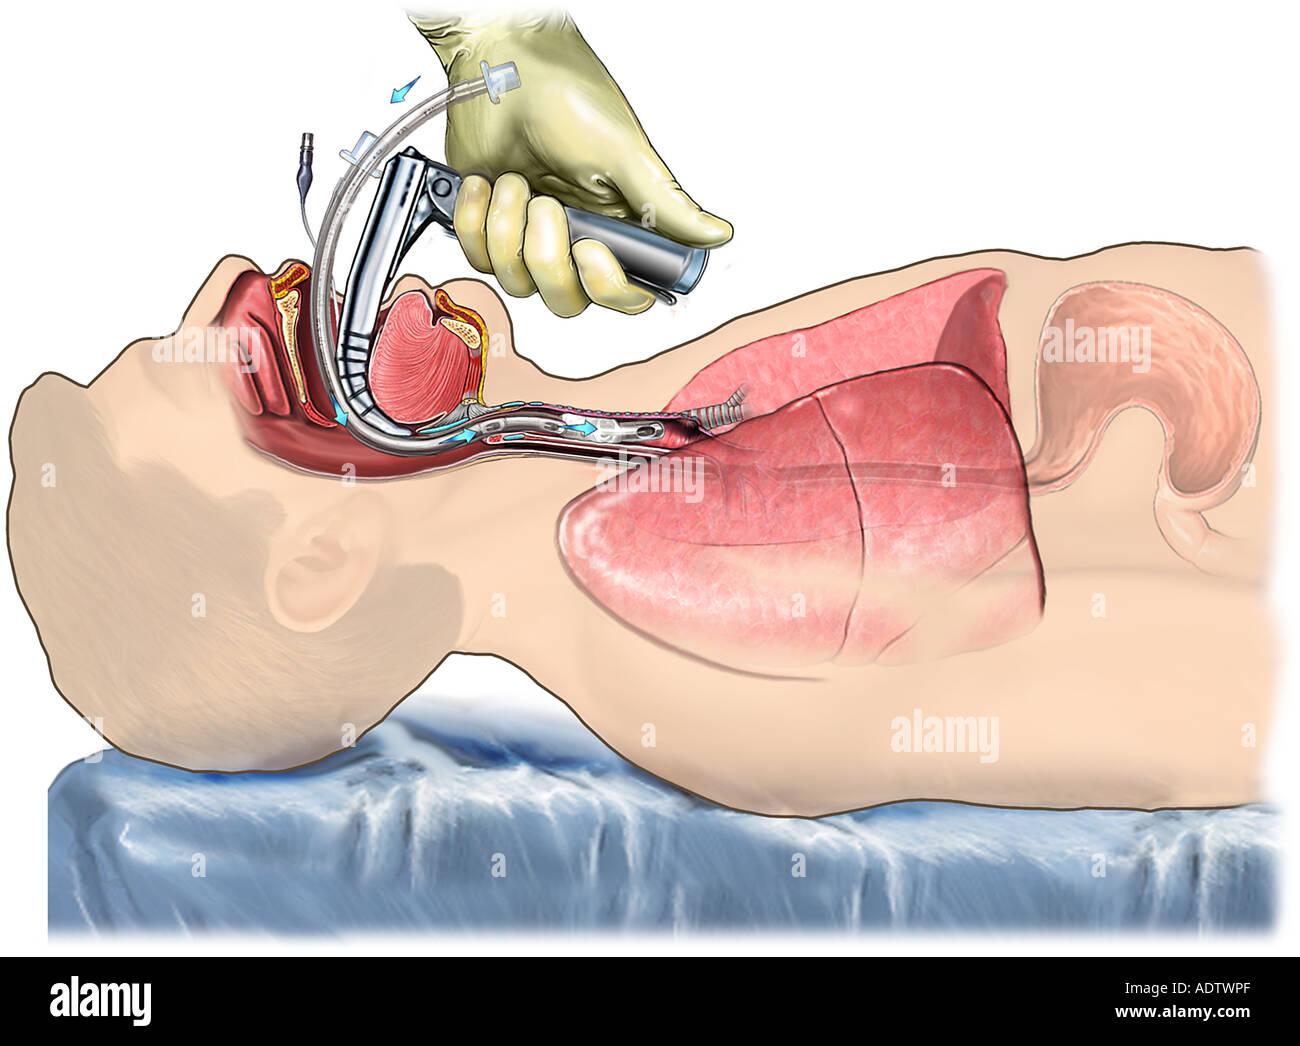 Proper Laryngoscopic Endotracheal Intubation Stock Photo: 7710510 ...